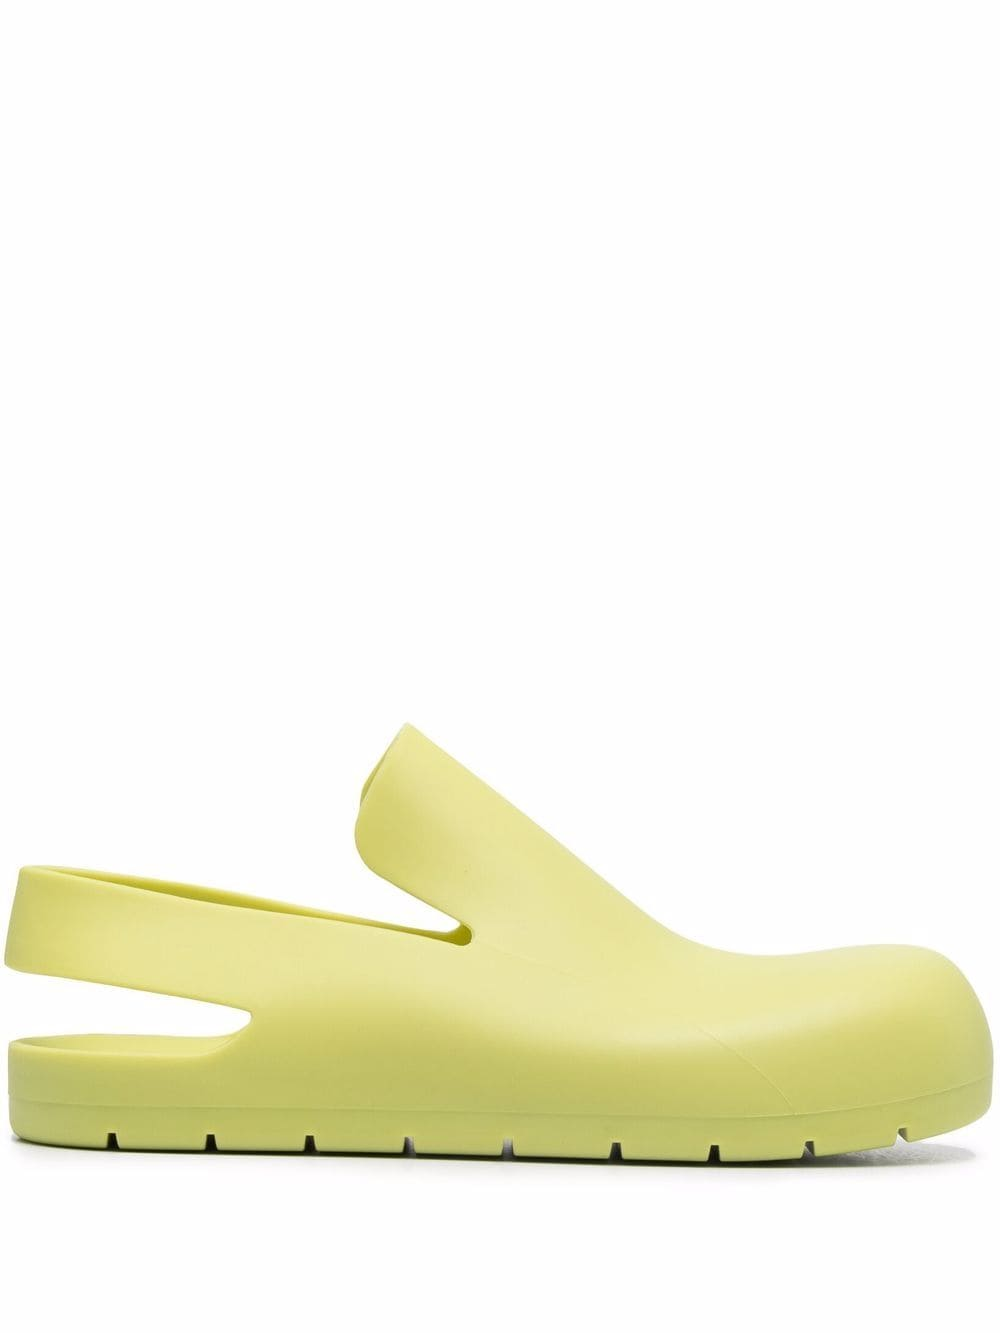 bottega veneta puddle sandals reviews